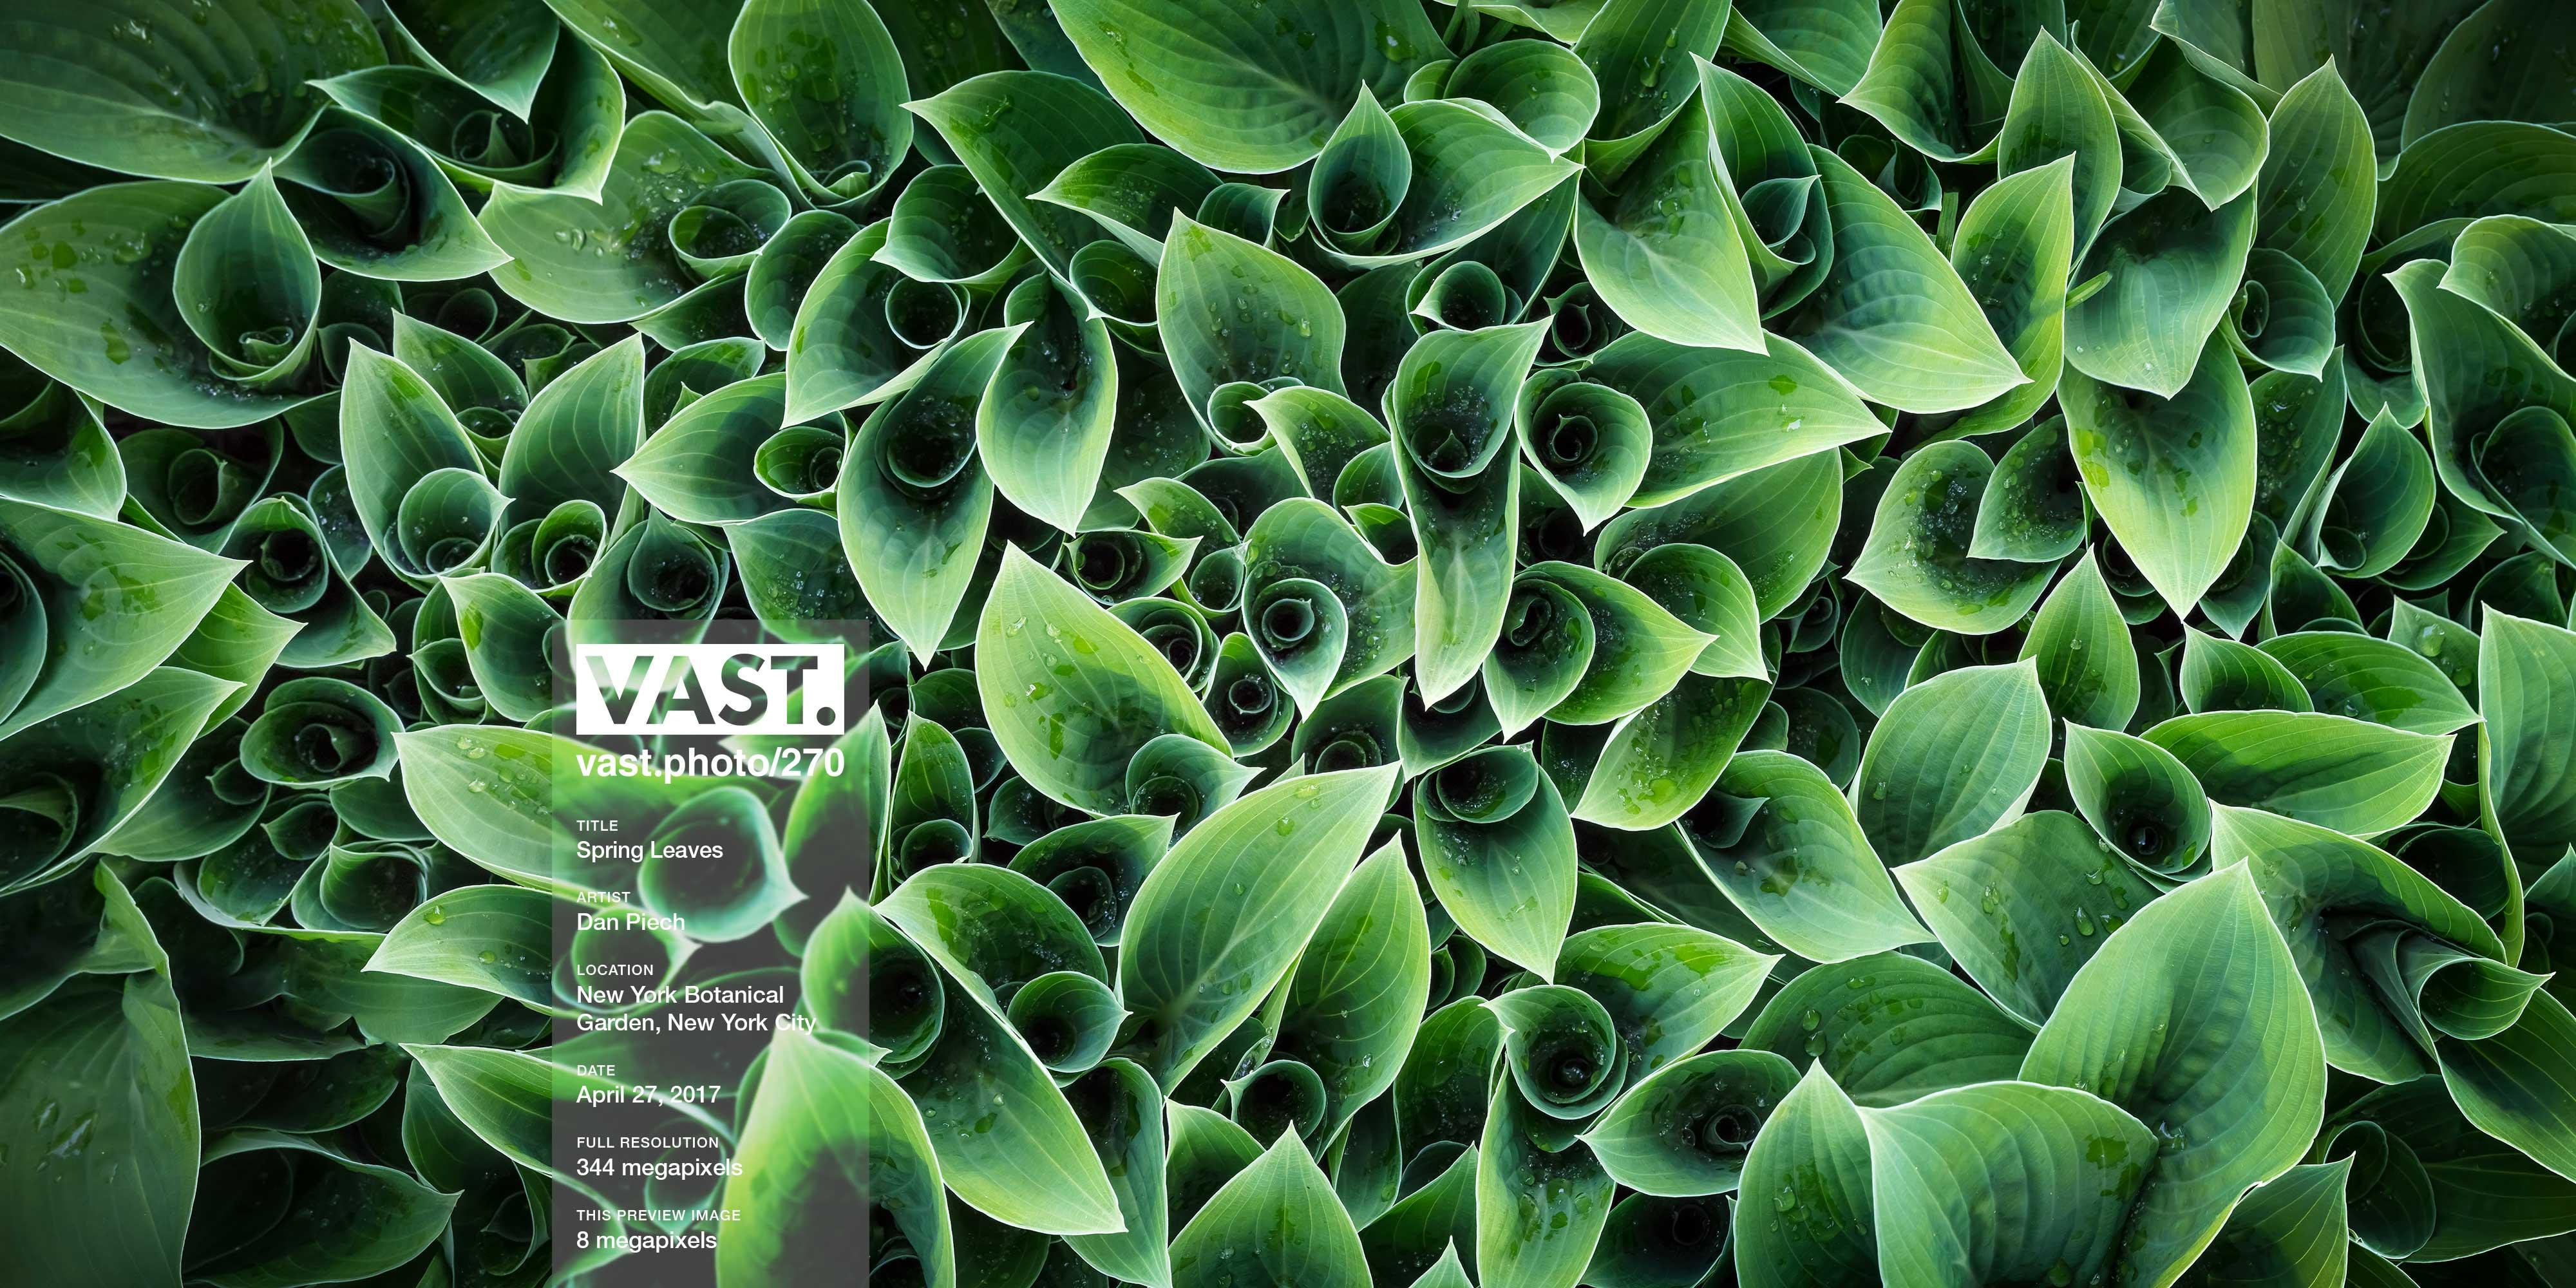 Macro Photos of Leaves: High Resolution Fine Art Prints - VAST